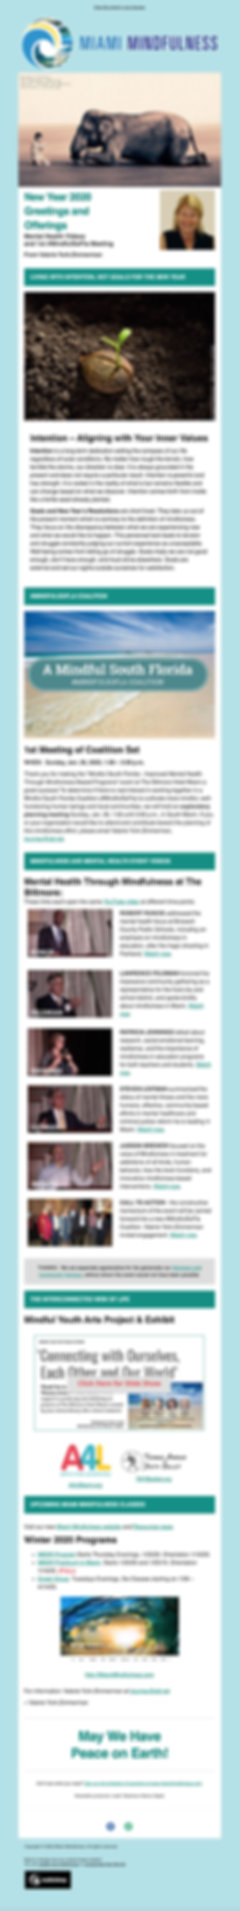 MM-newsletter-jan-2020-event-wrapup.jpg